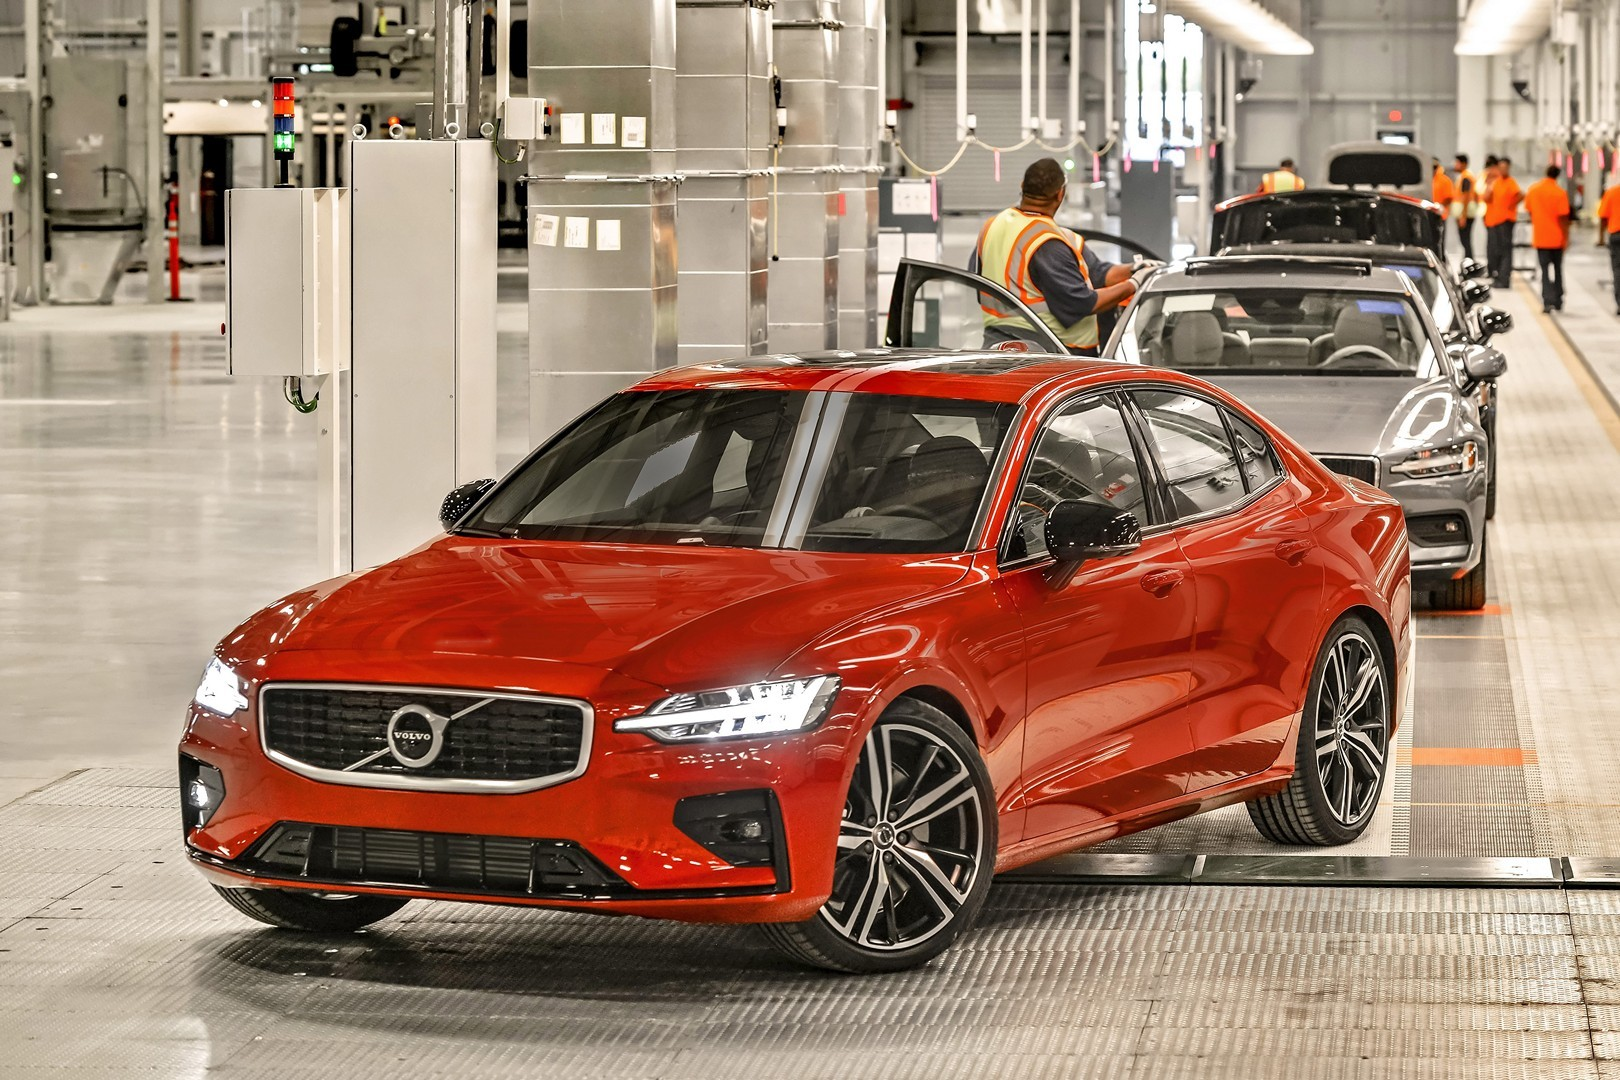 2019 Volvo S60 Sedan Rendering Should Be Accurate - autoevolution